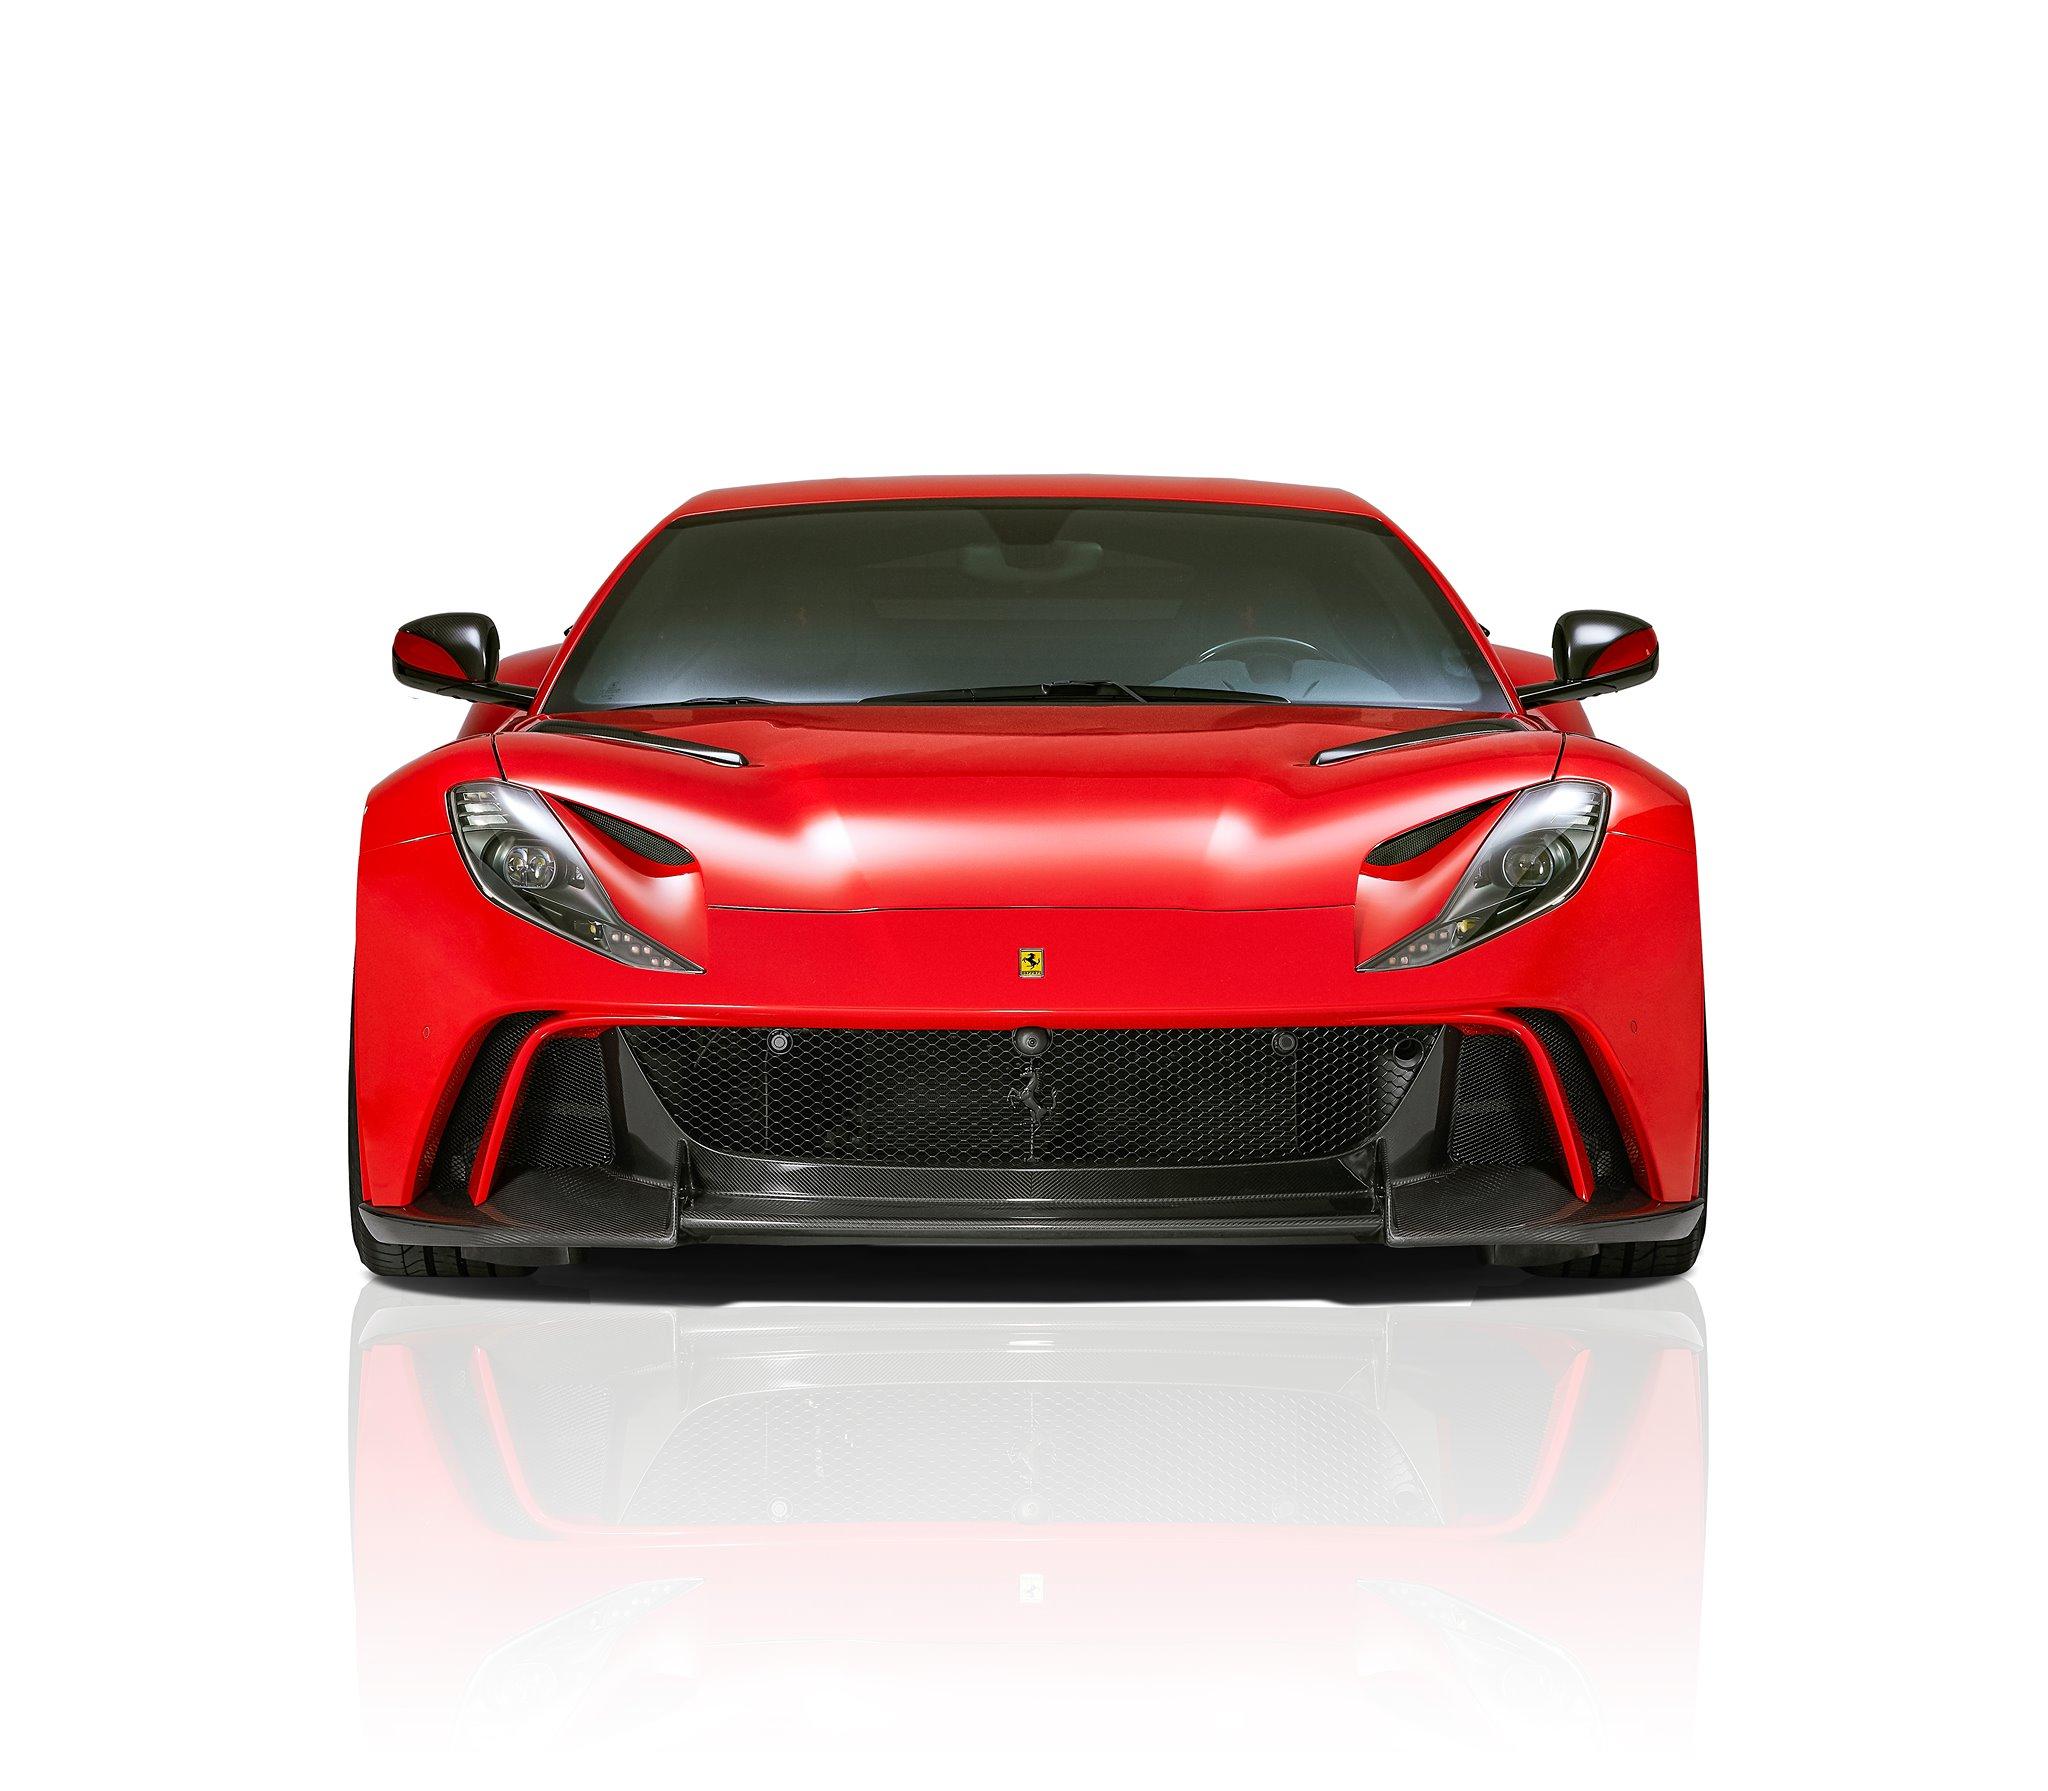 Ferrari-812-Superfast-N-Largo-by-Novitec-21